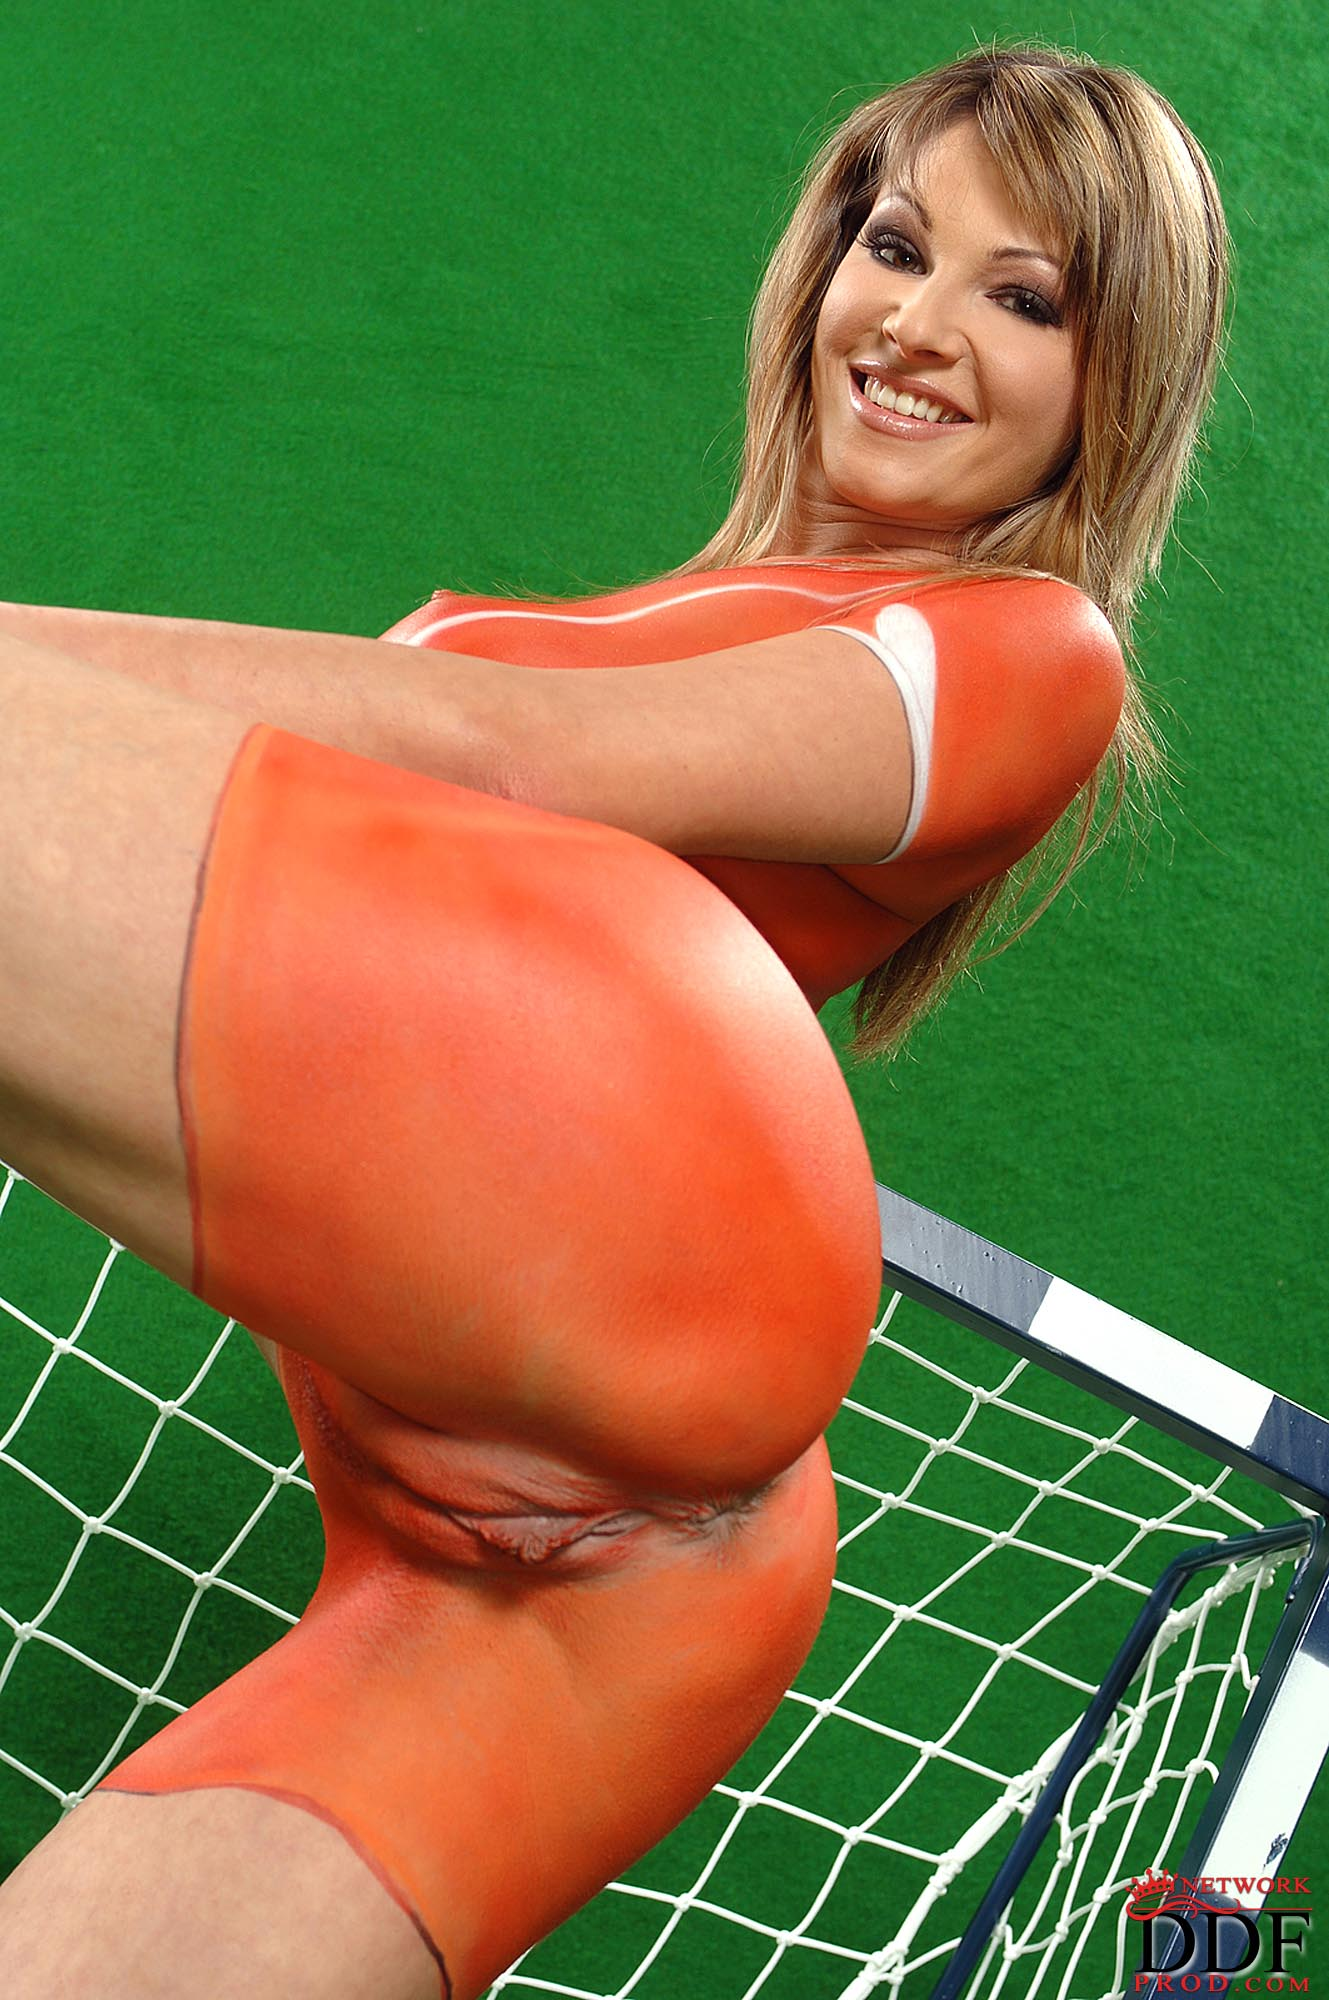 Фото порно футболисток 16 фотография